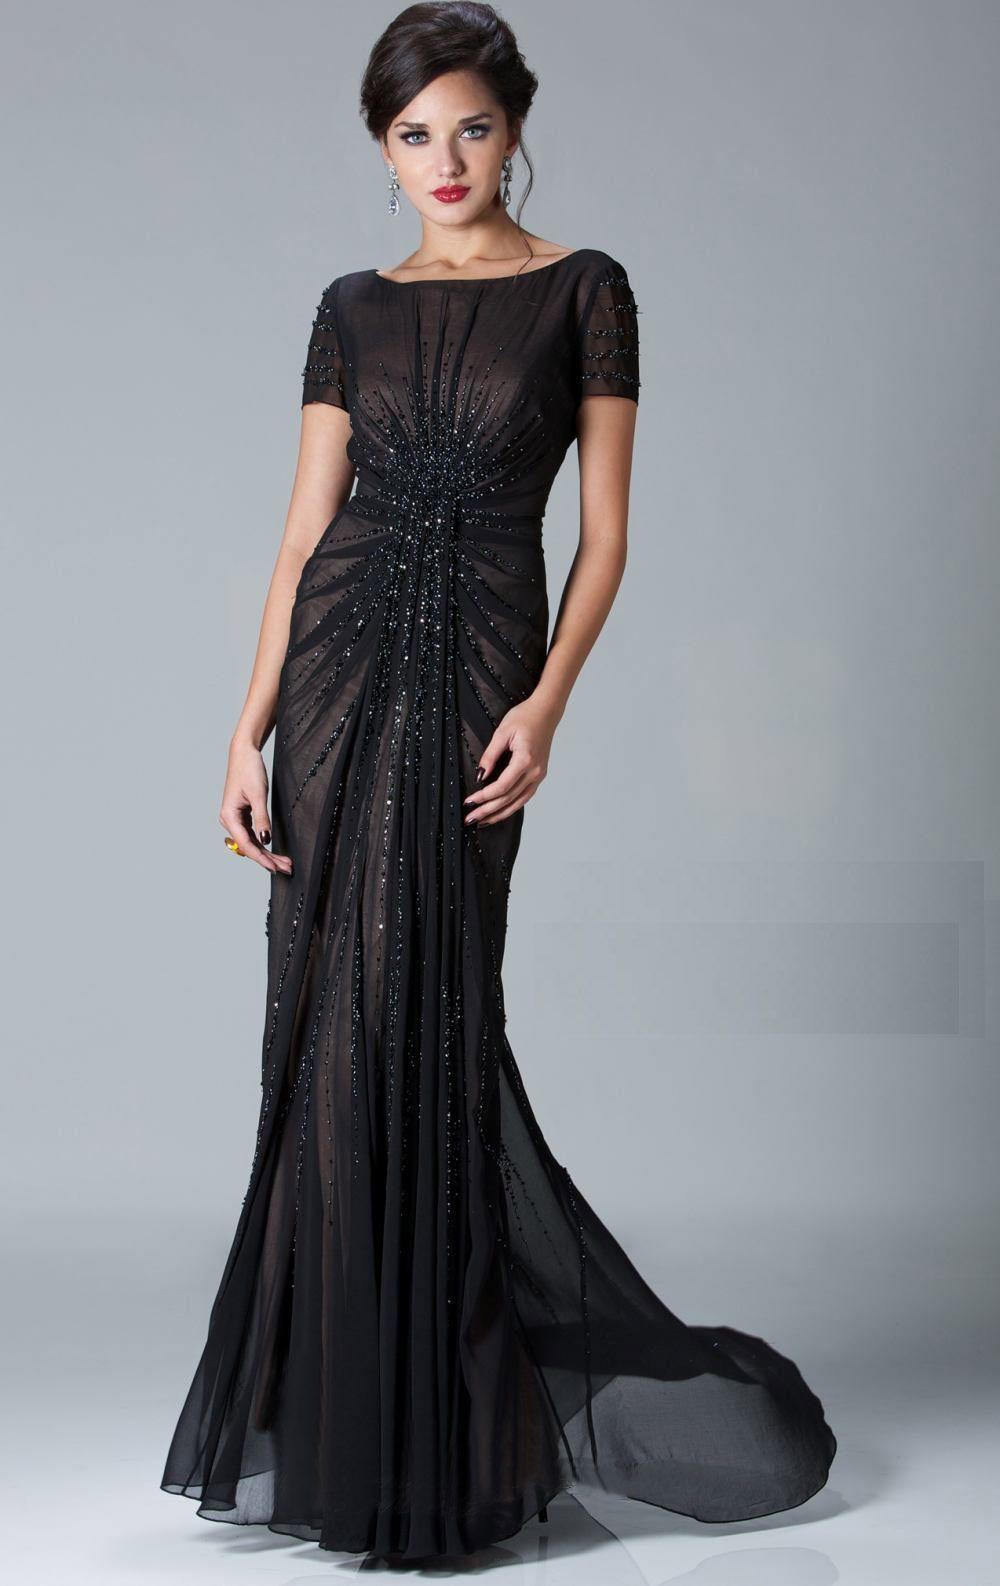 Modern Prom Dresses In Harrisburg Pa Elaboration - Wedding Dress ...